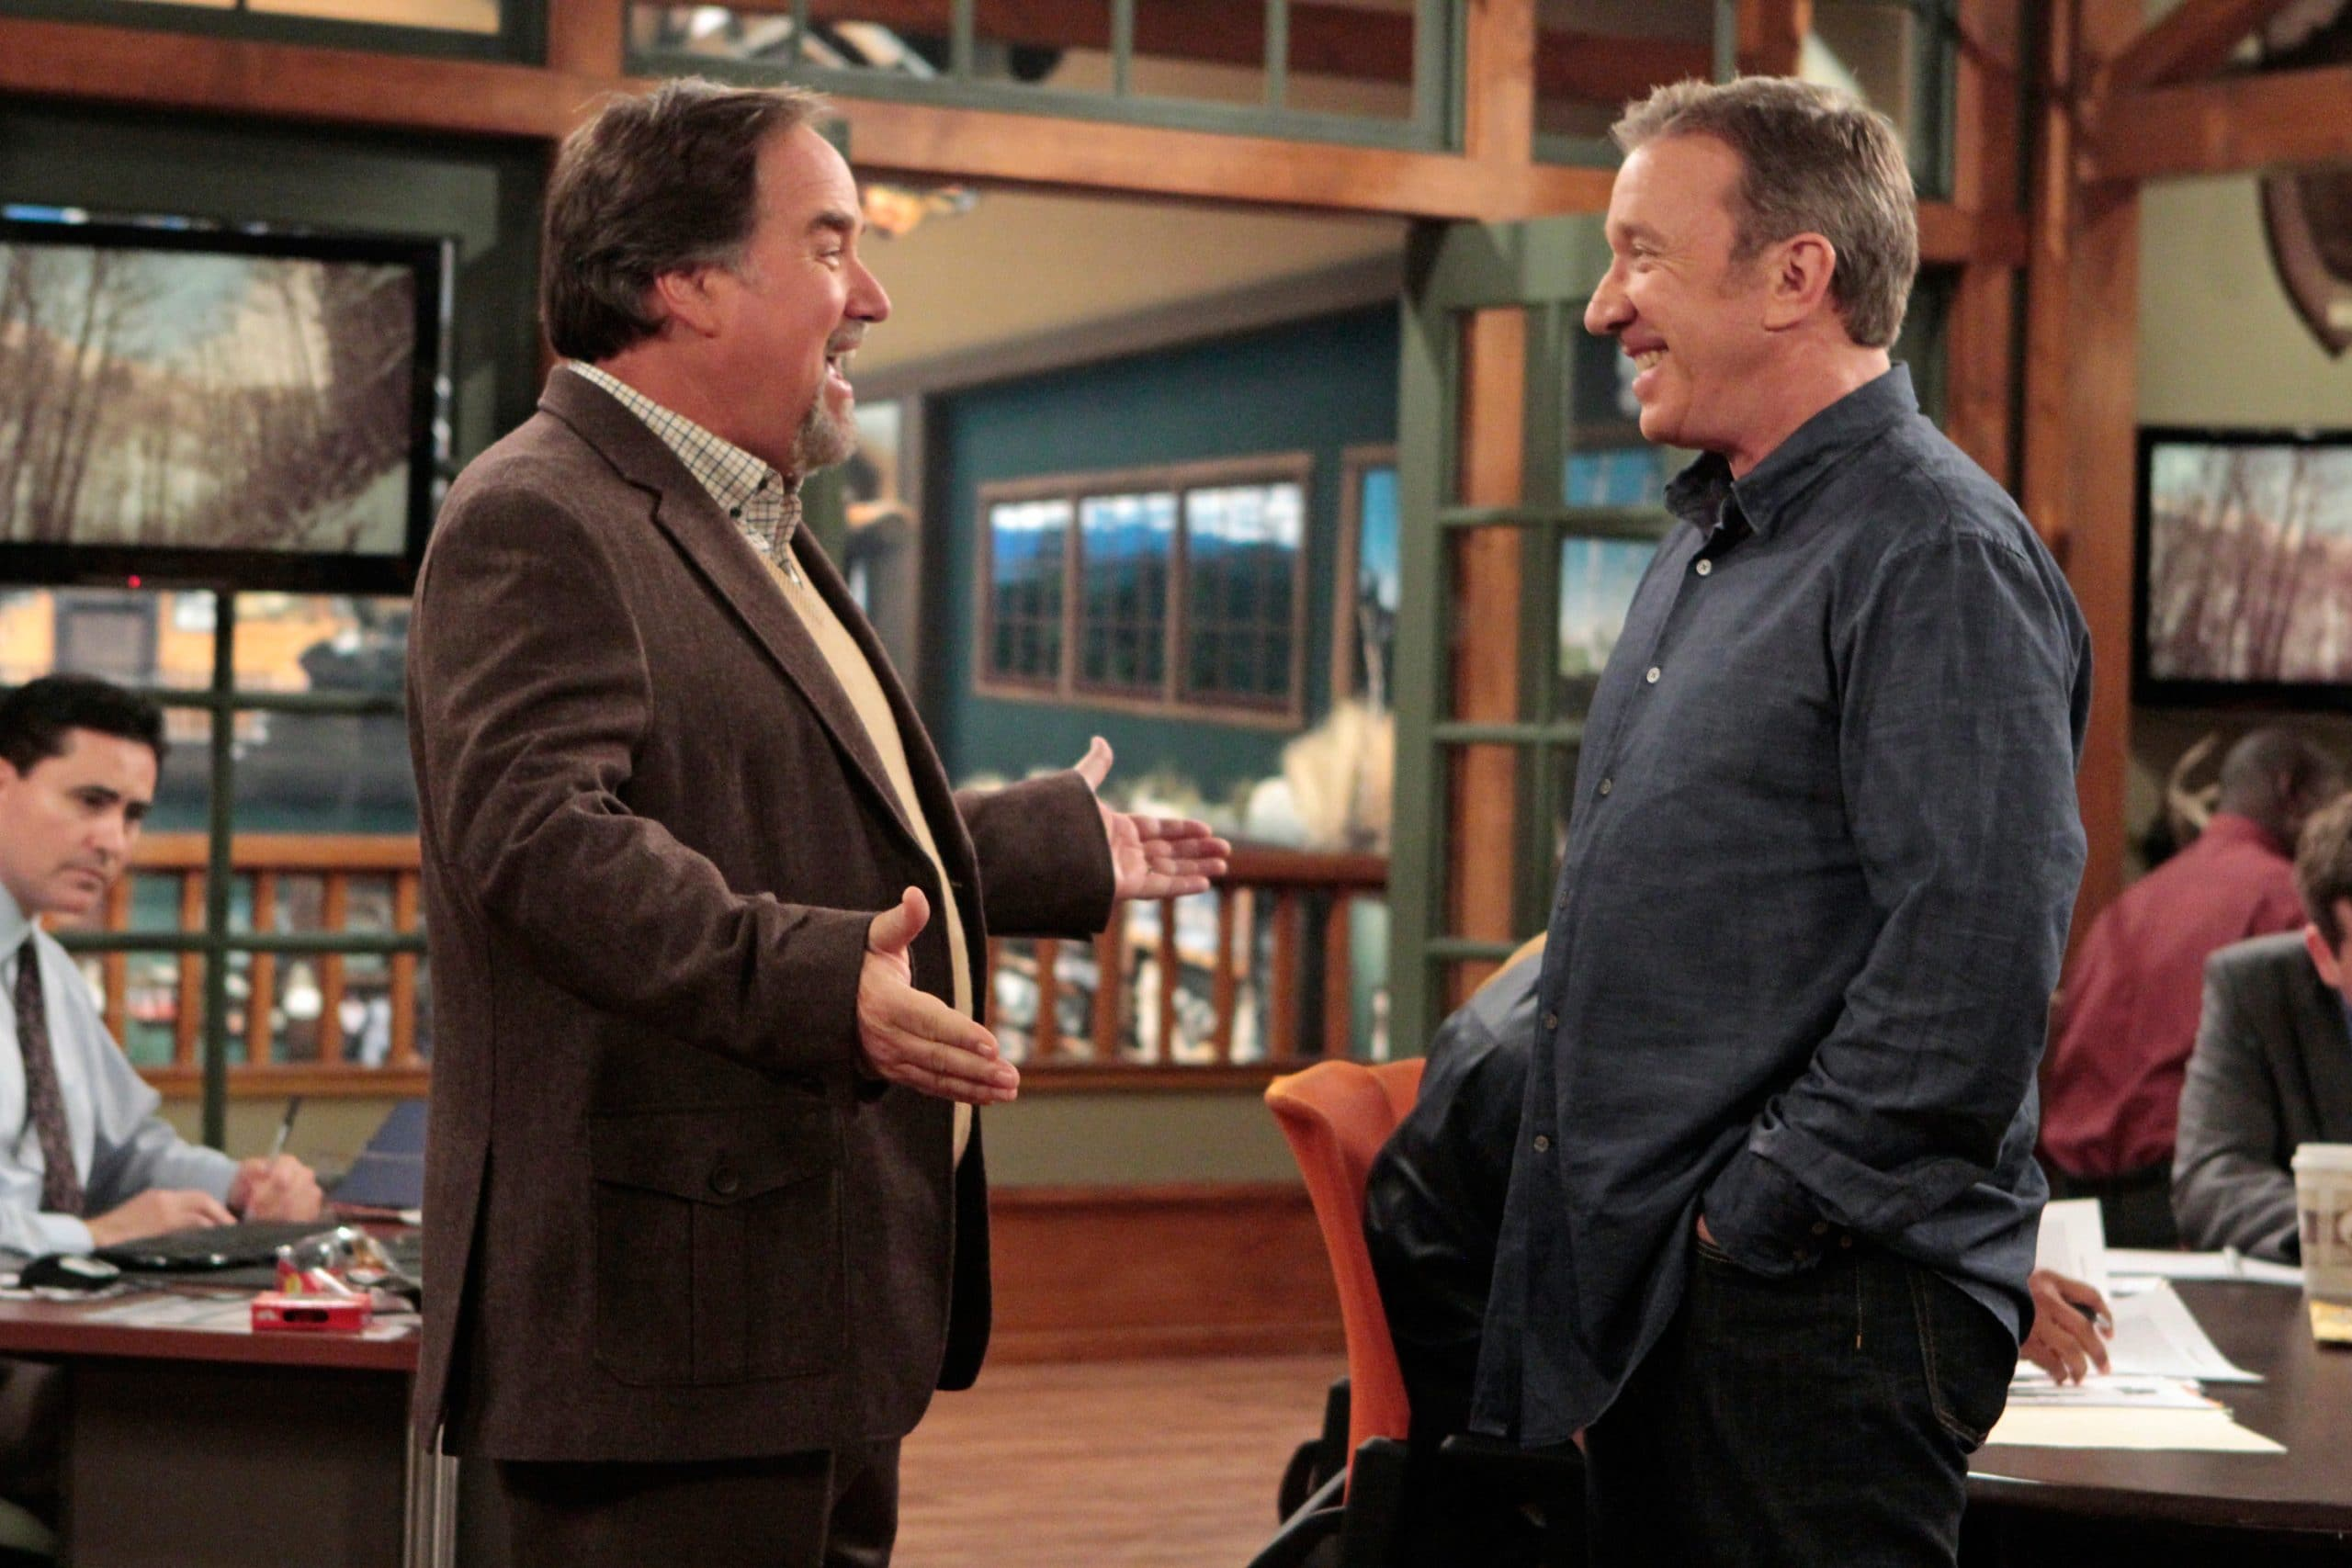 LAST MAN STANDING, l-r: Richard Karn, Tim Allen in 'Attractive Architect' (Season 2, Episode 9, aired January 11, 2013), 2011